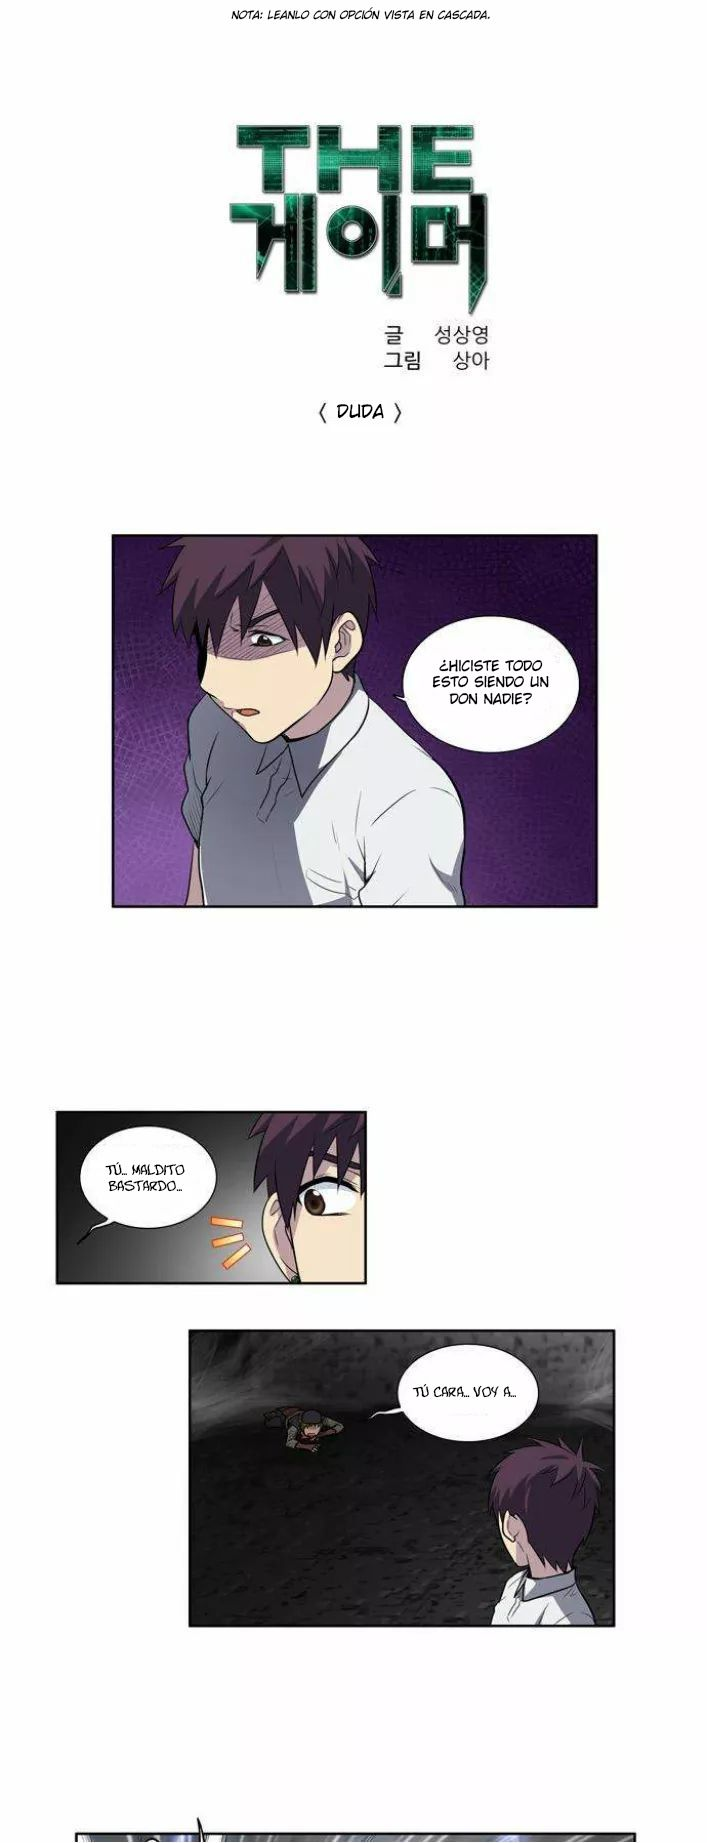 https://c5.ninemanga.com/es_manga/61/1725/484924/44ae89d55000adae176d4454023c237c.jpg Page 2